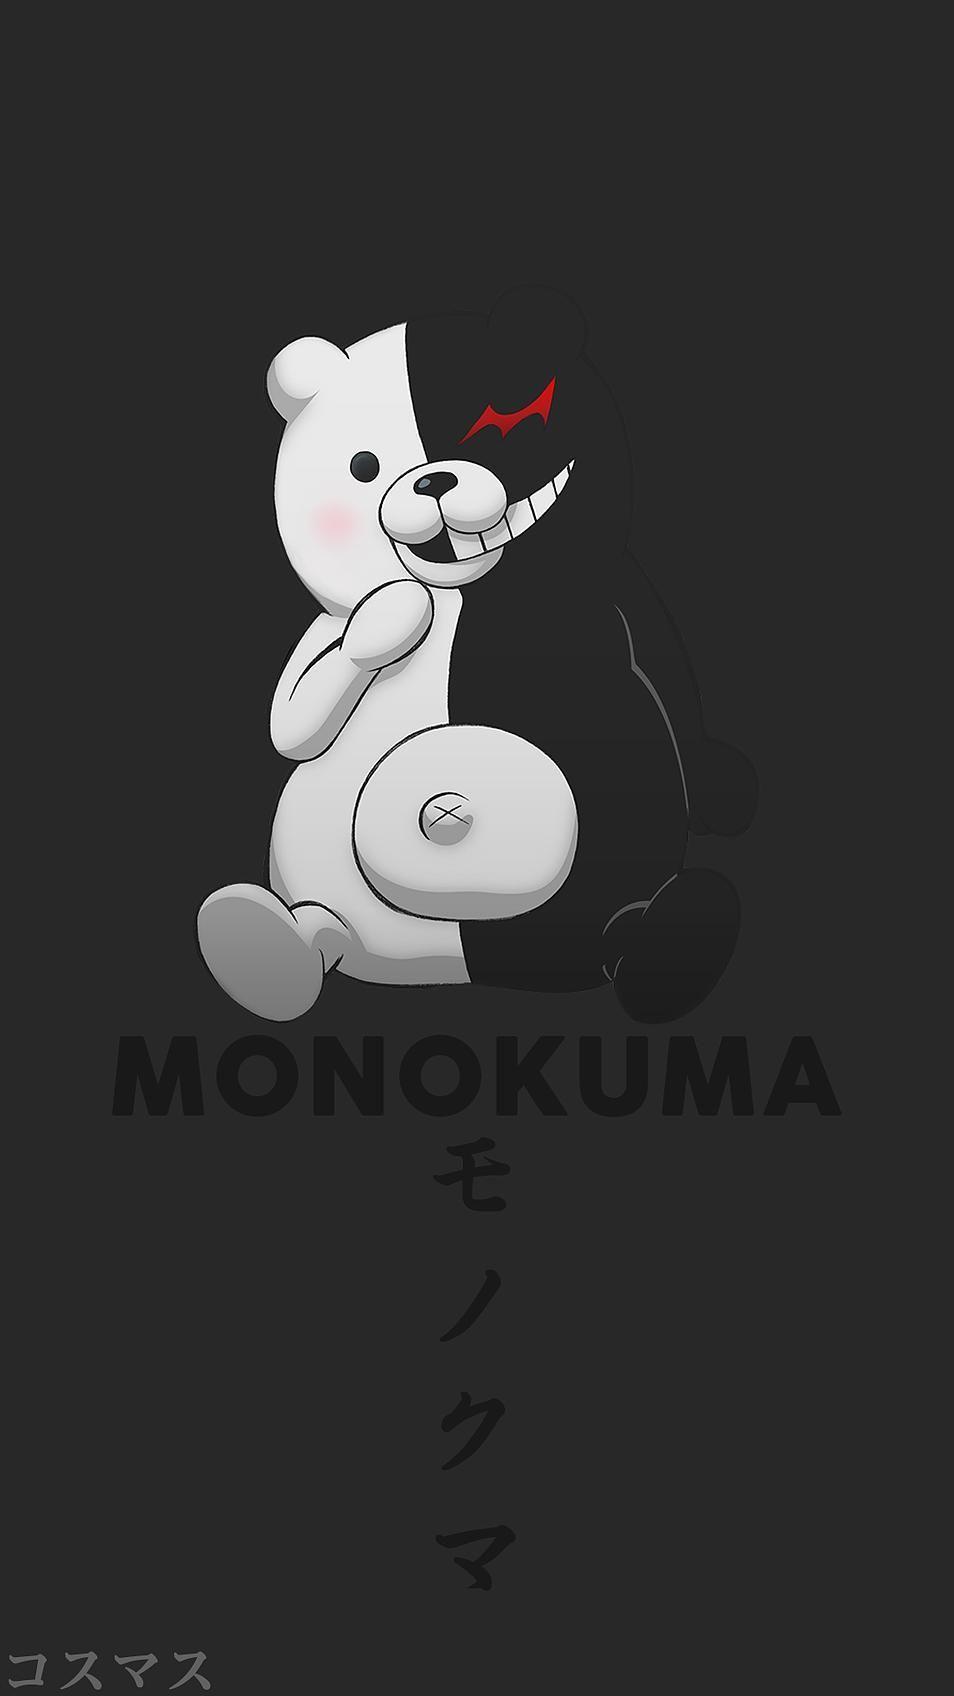 Pin By Shoto Midoriya On Monokuma In 2020 Anime Wallpaper Iphone Anime Wallpaper Phone Cute Anime Wallpaper